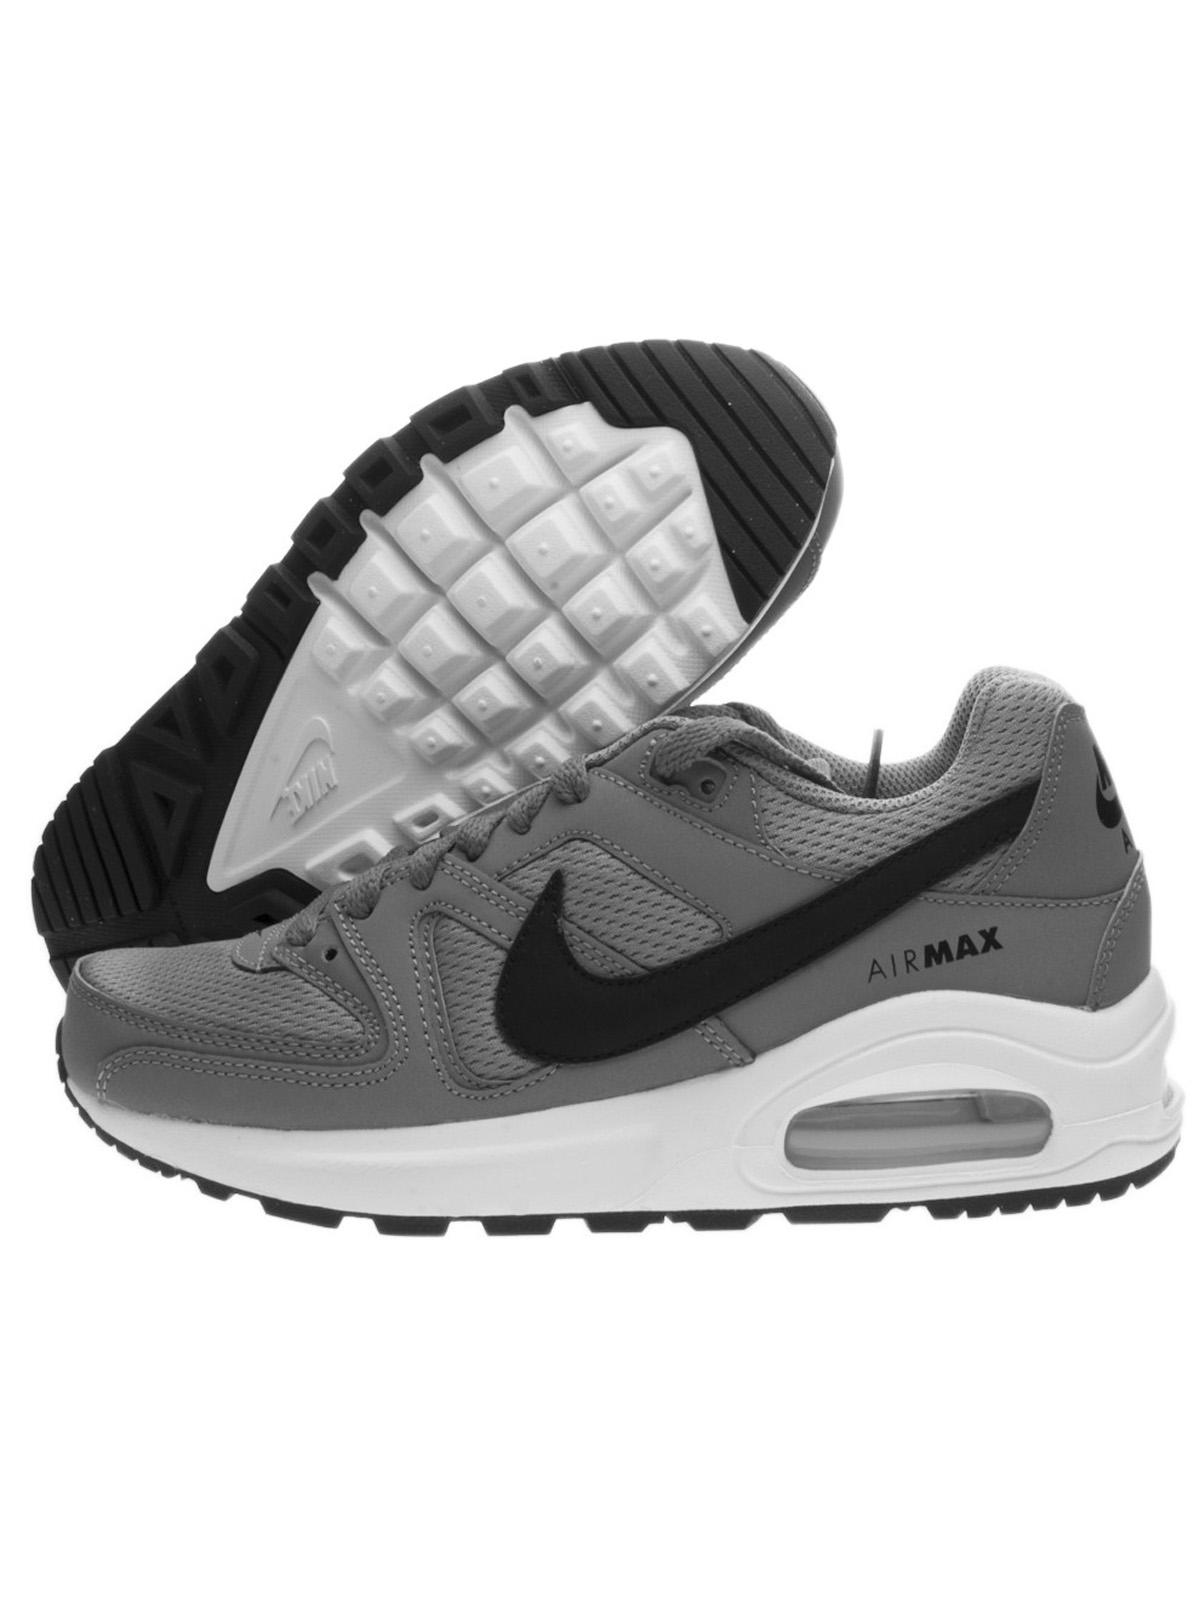 check out d265c 80cbf Nike Air Max Command (GS) - NIKE - Citysport